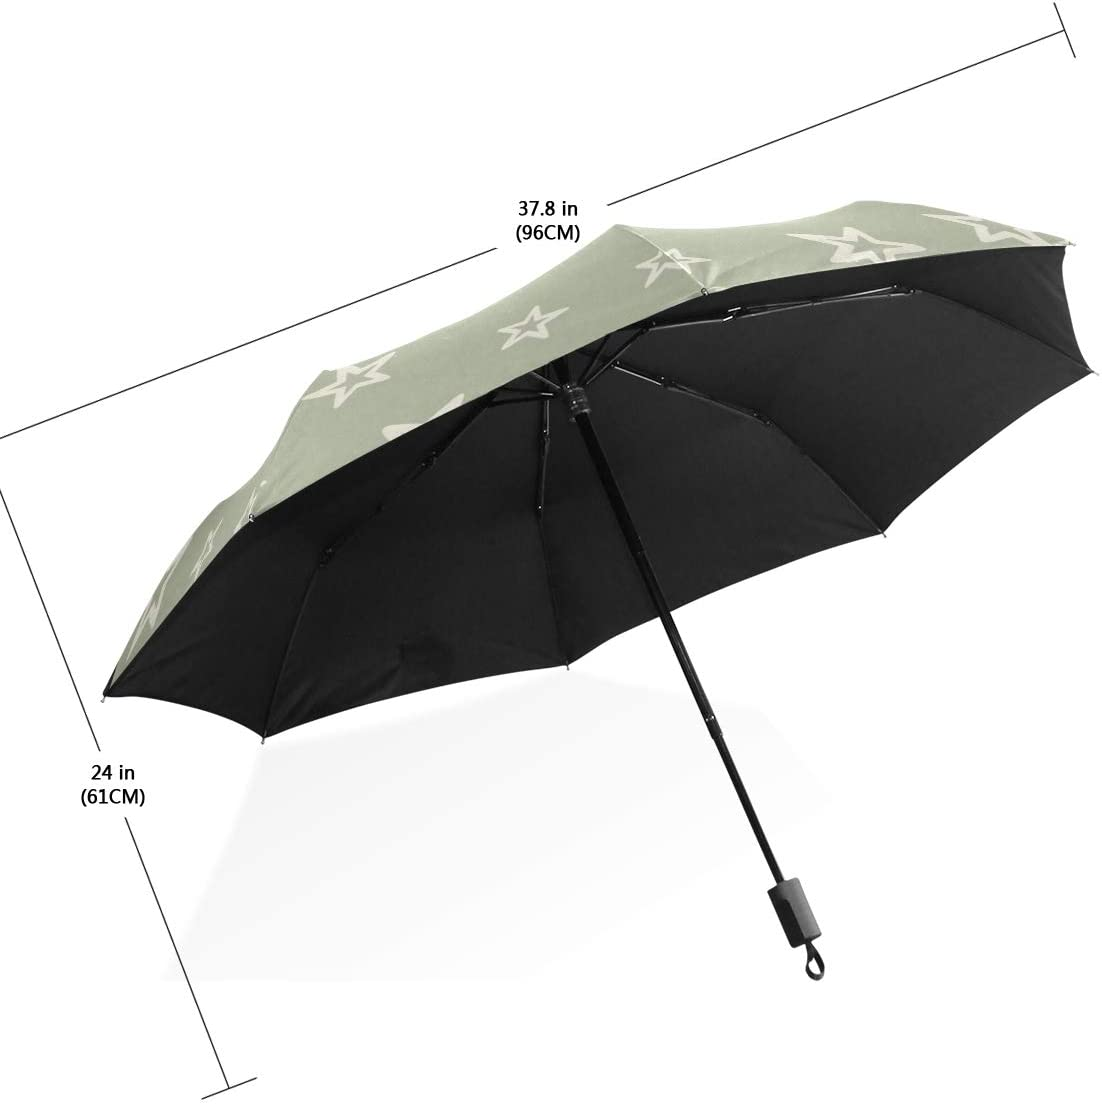 Travel Umbrella Cute Different Background With Stars Anti Uv Compact 3 Fold Art Lightweight Foldable Umbrellas outside Printing Windproof Rain Sun Protection Umbrellas For Women Girls Kids